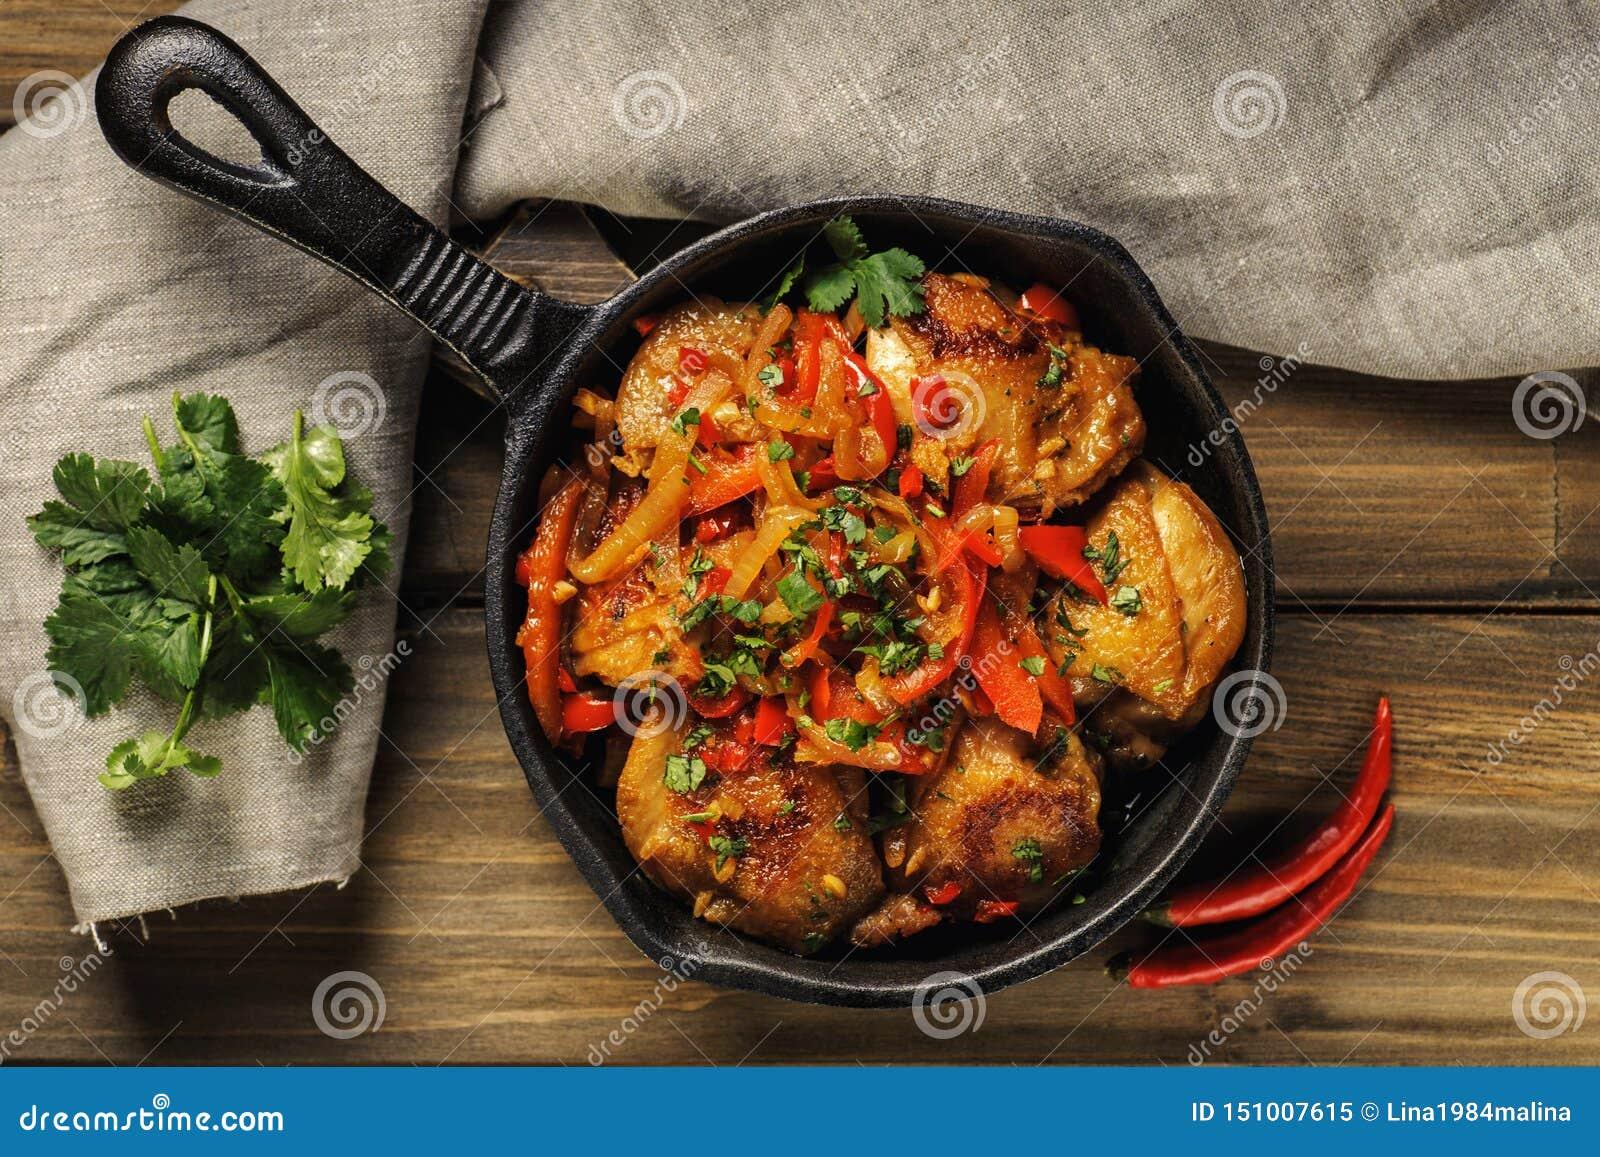 Gebratenes Huhn in der würzigen Soße mit Gemüse